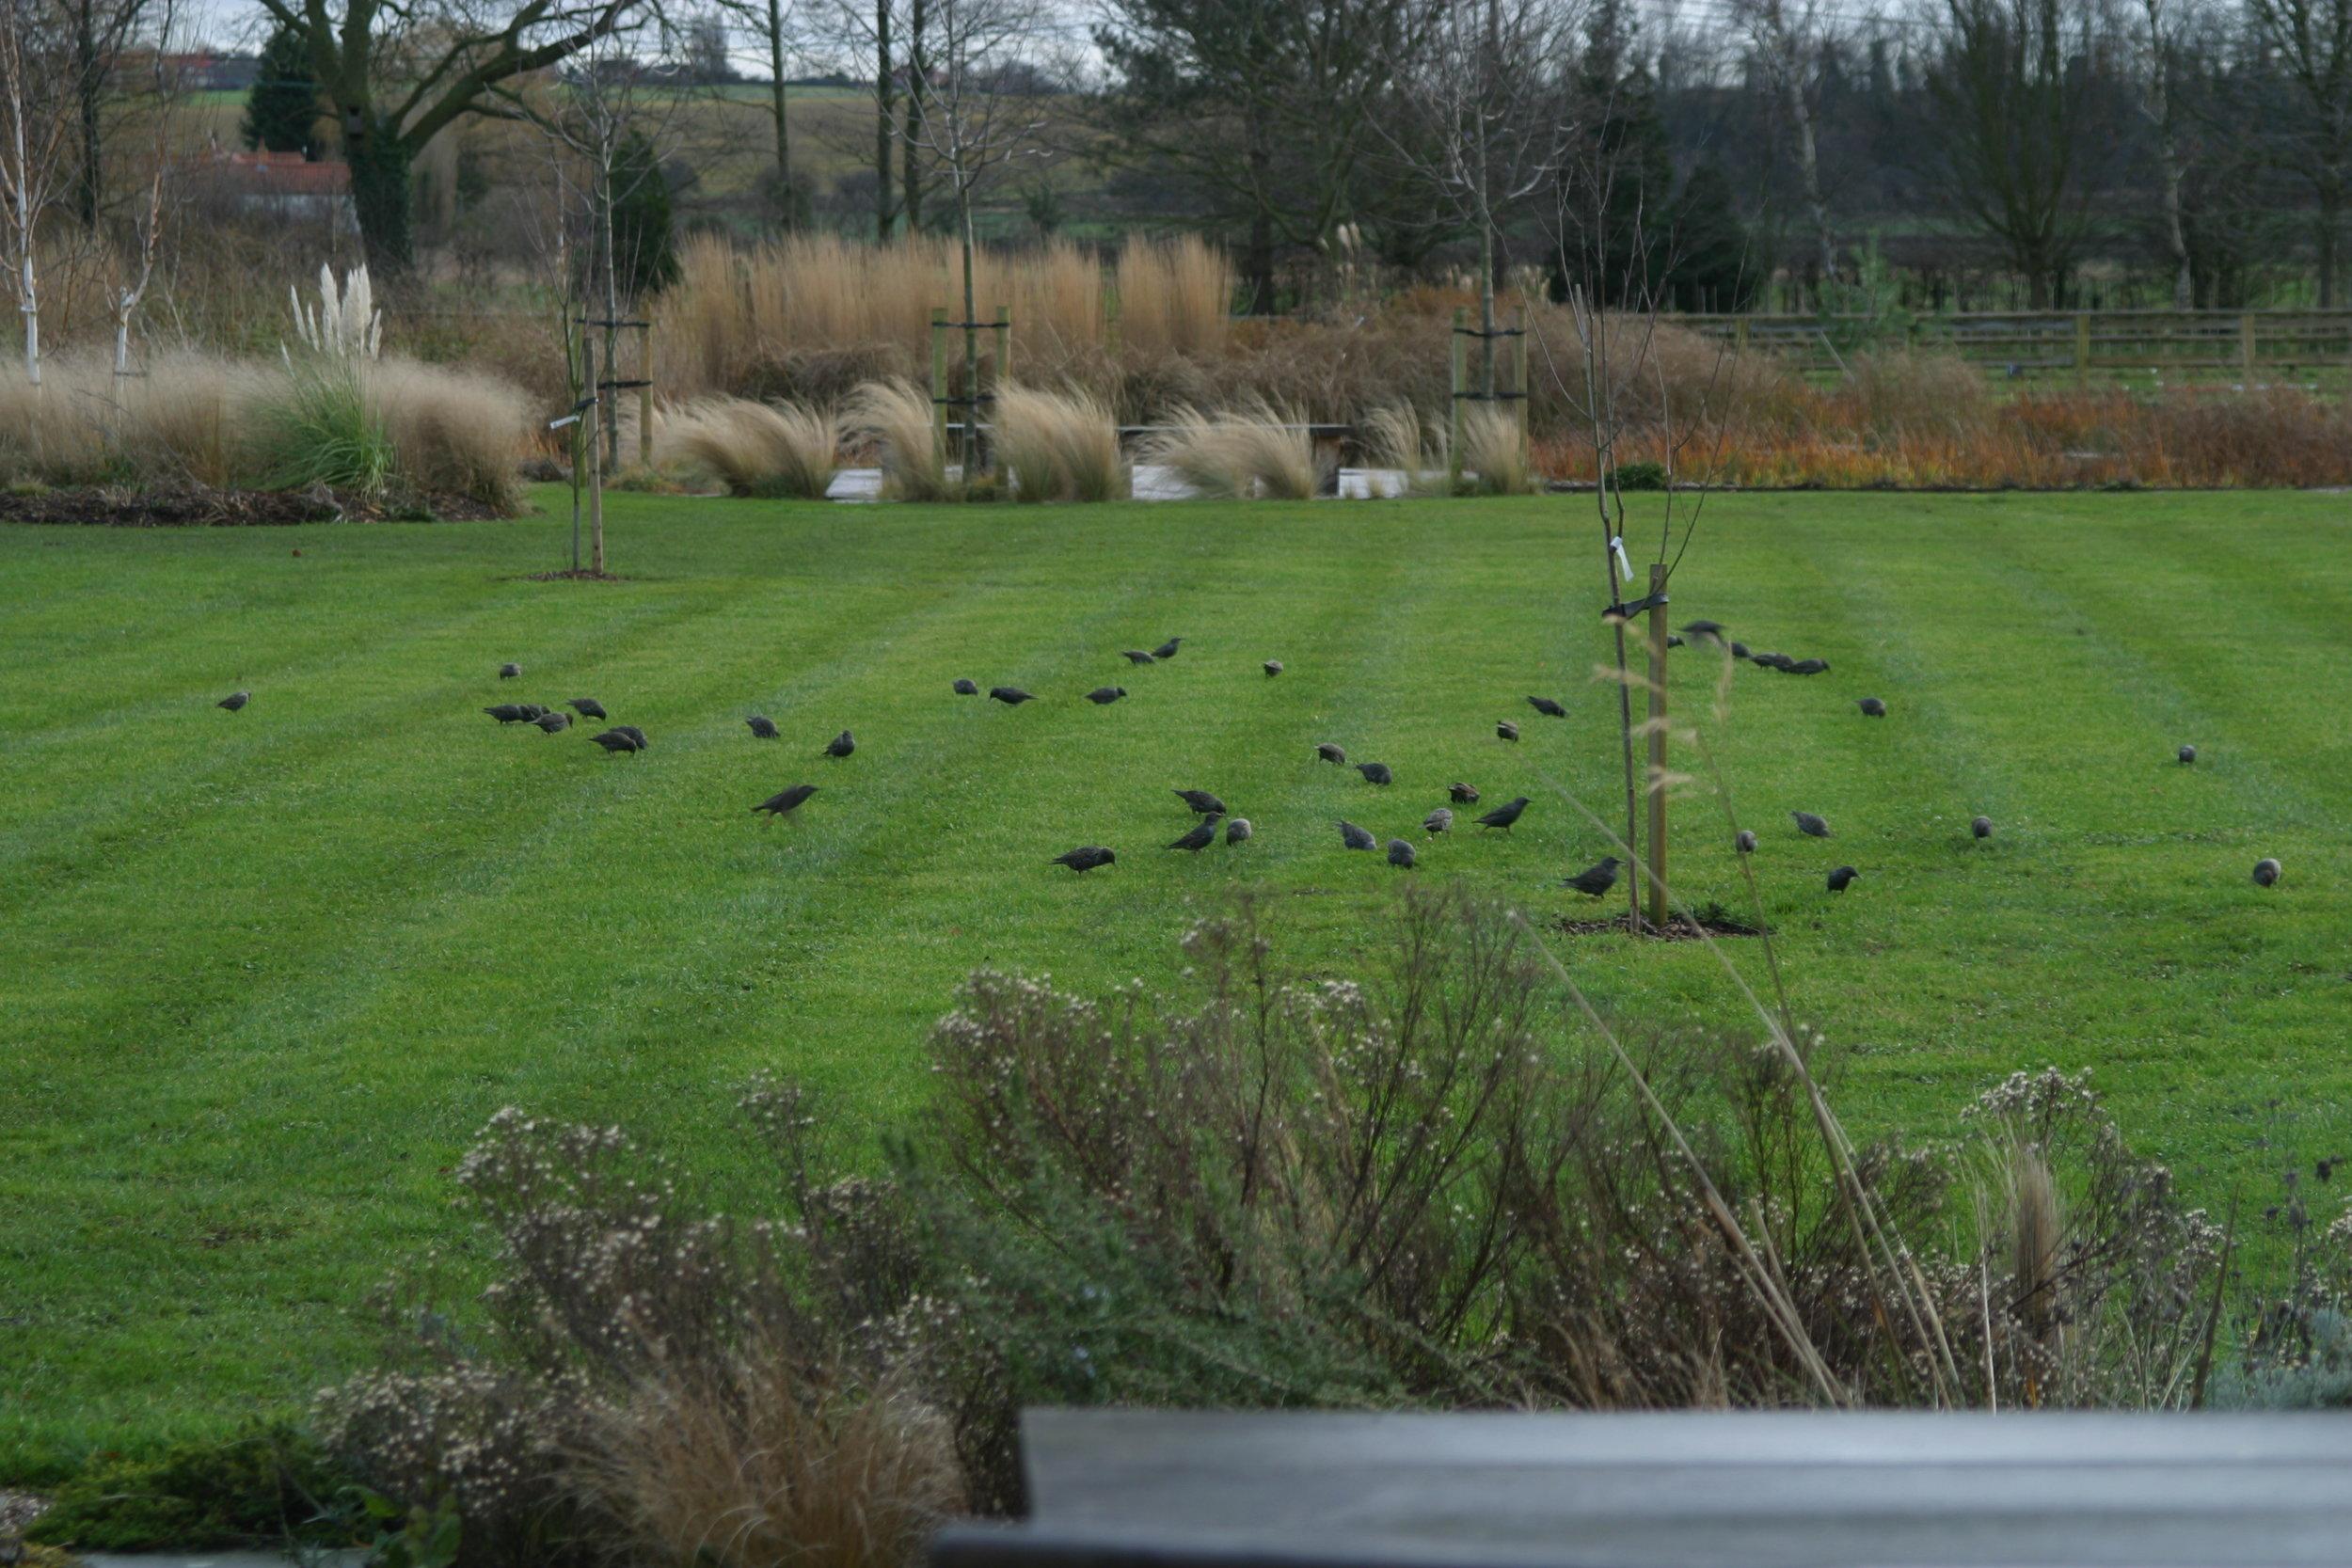 starlings feasting on the lawn in winter.JPG